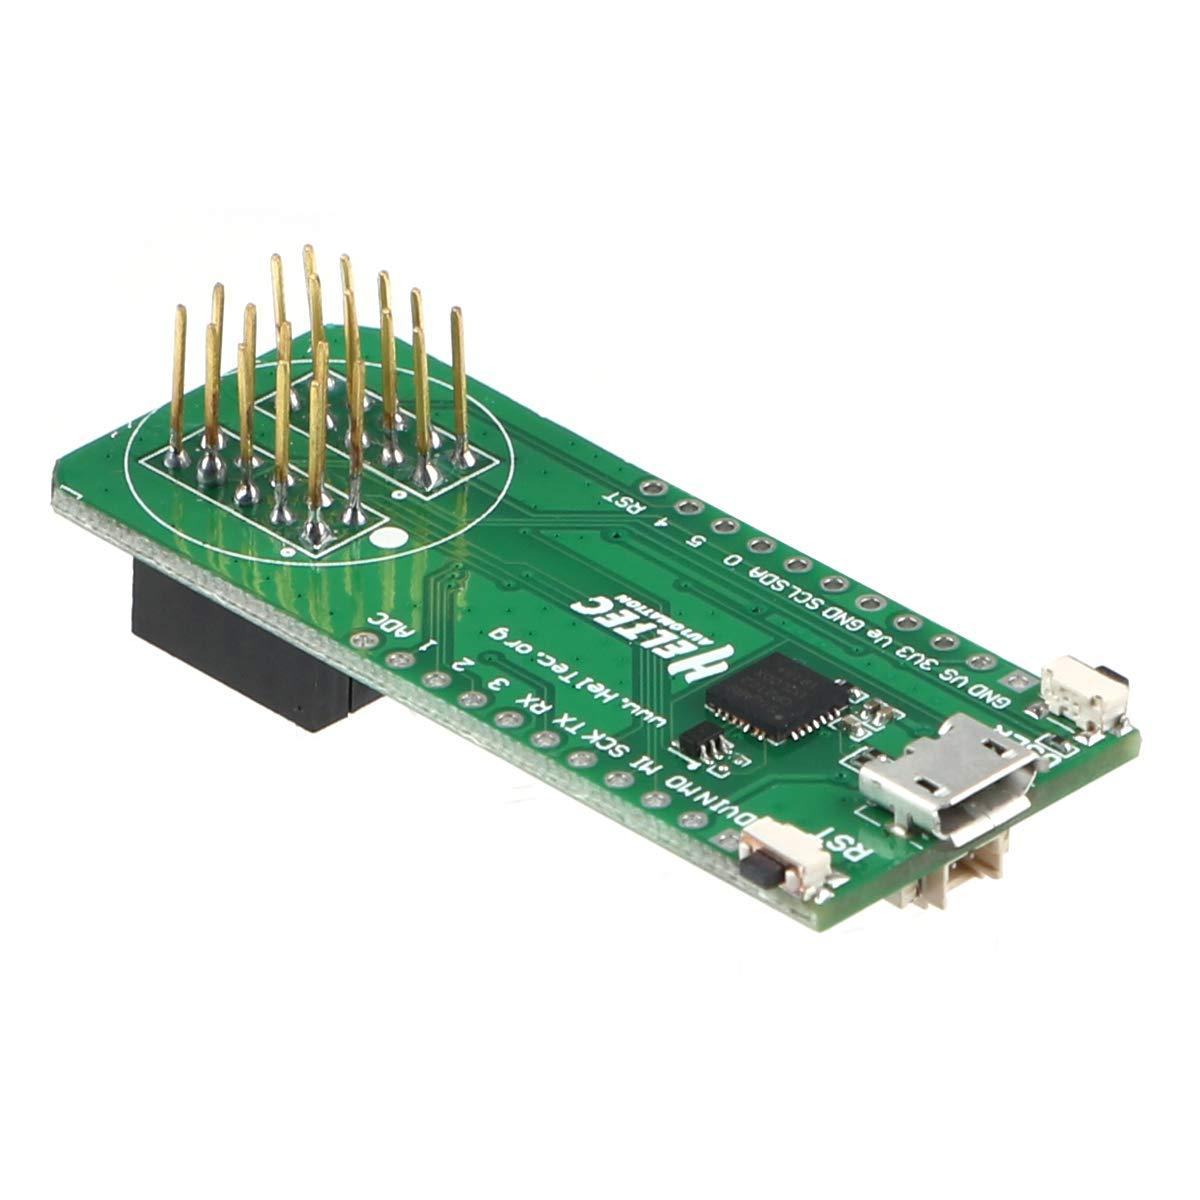 seamuing USB-Adapter Board Dedicated Debugger mit CP2102 Power Management f/ür Kapsel Lora Sensor HTCC-AC01